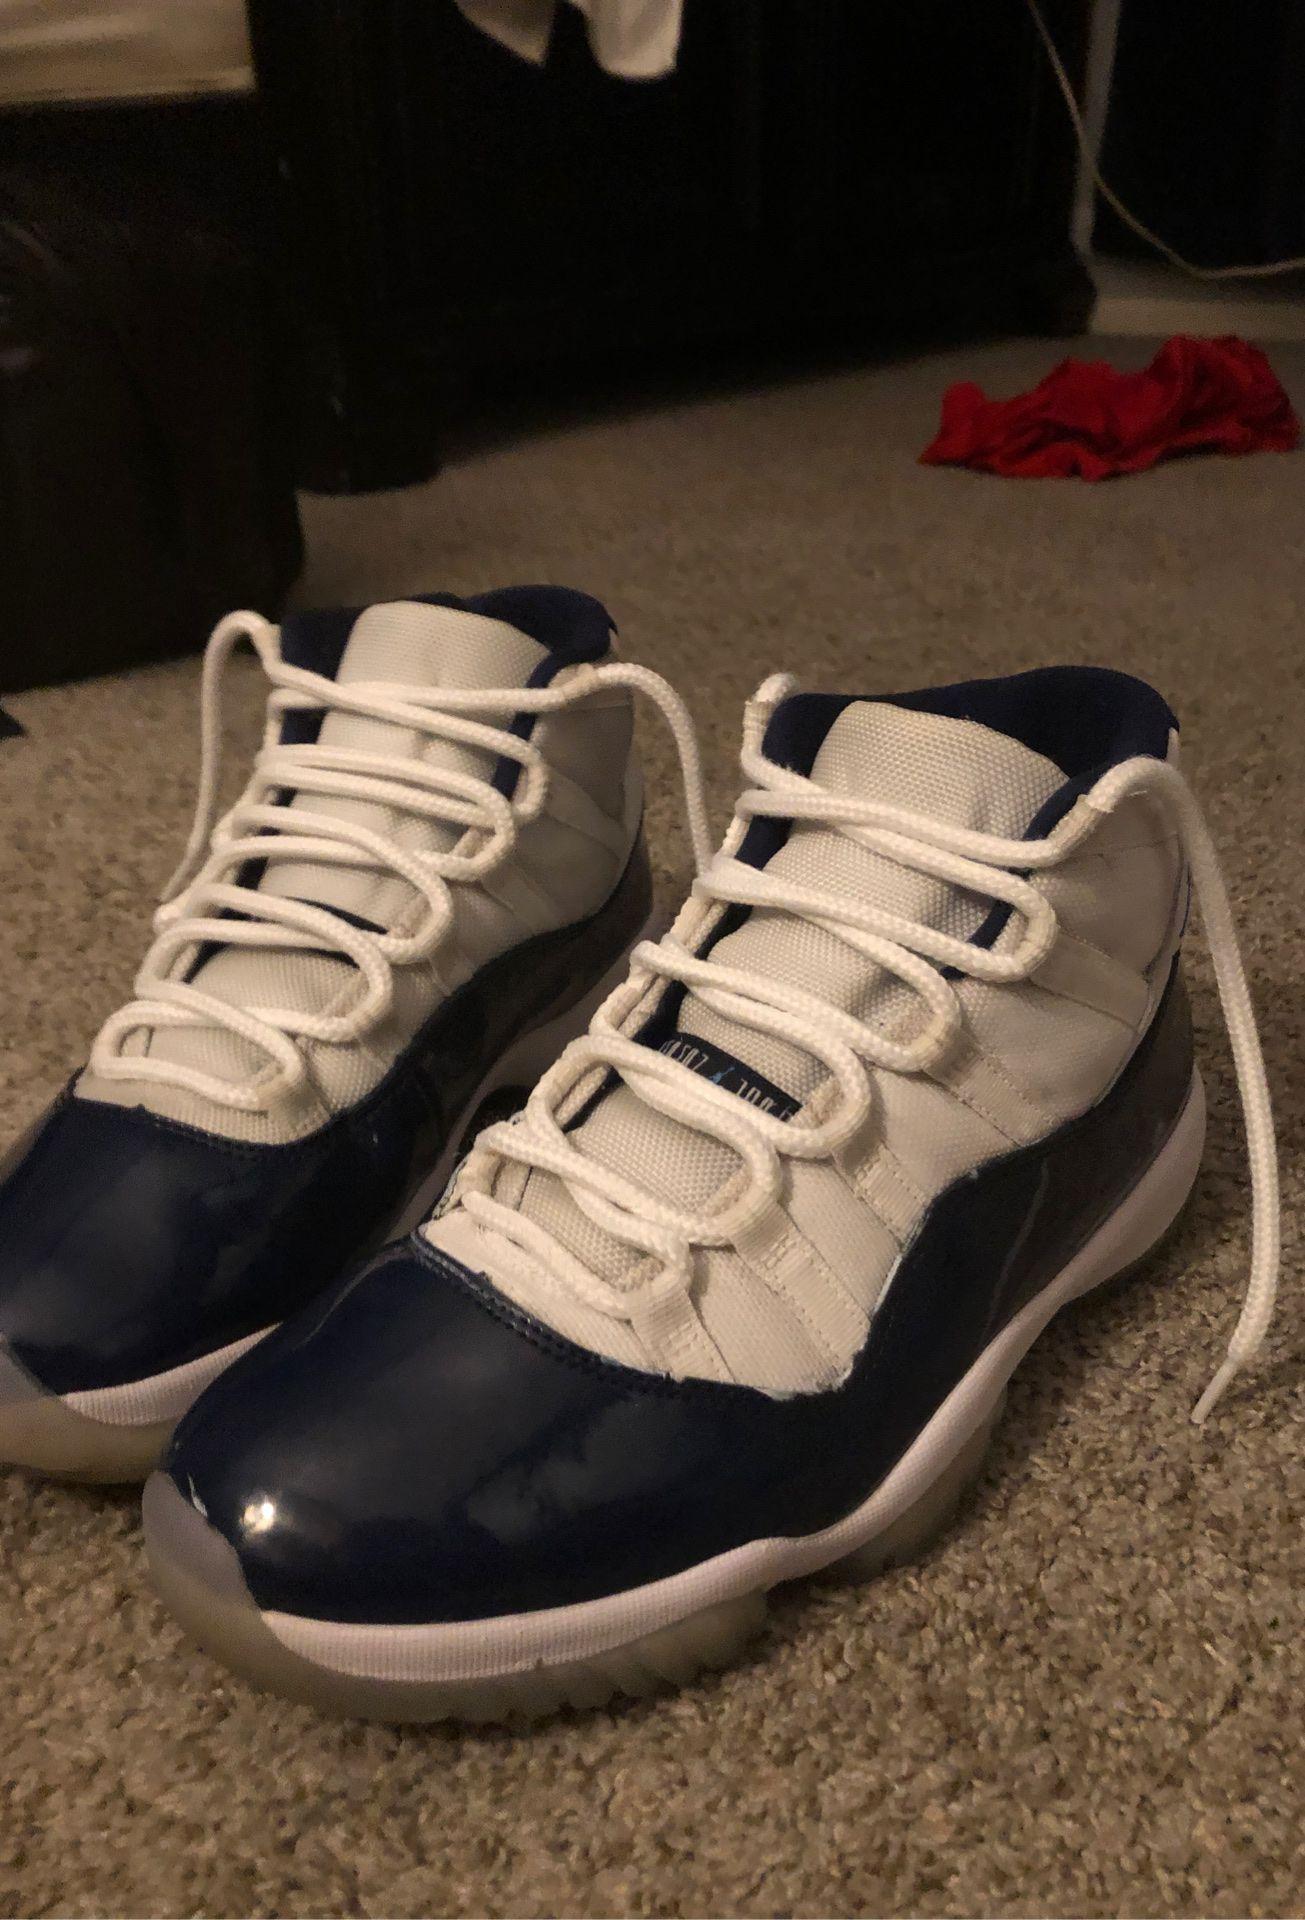 Air Jordan 11 Retro (Size 10)